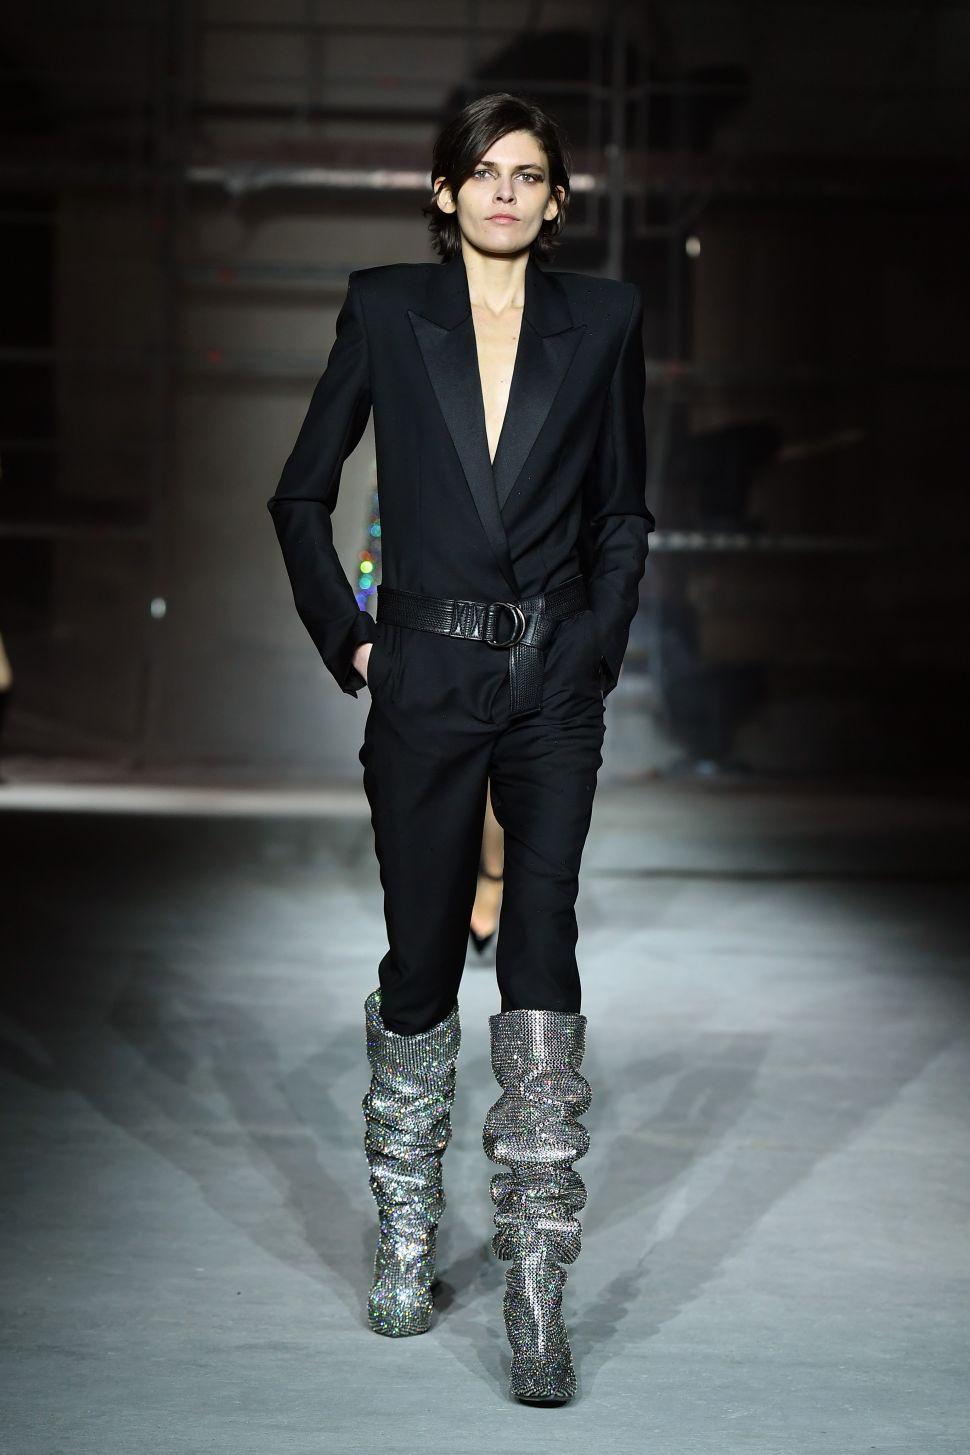 The $10K YSL Boots With a Wait-List; Nicki Minaj Is Now a Model